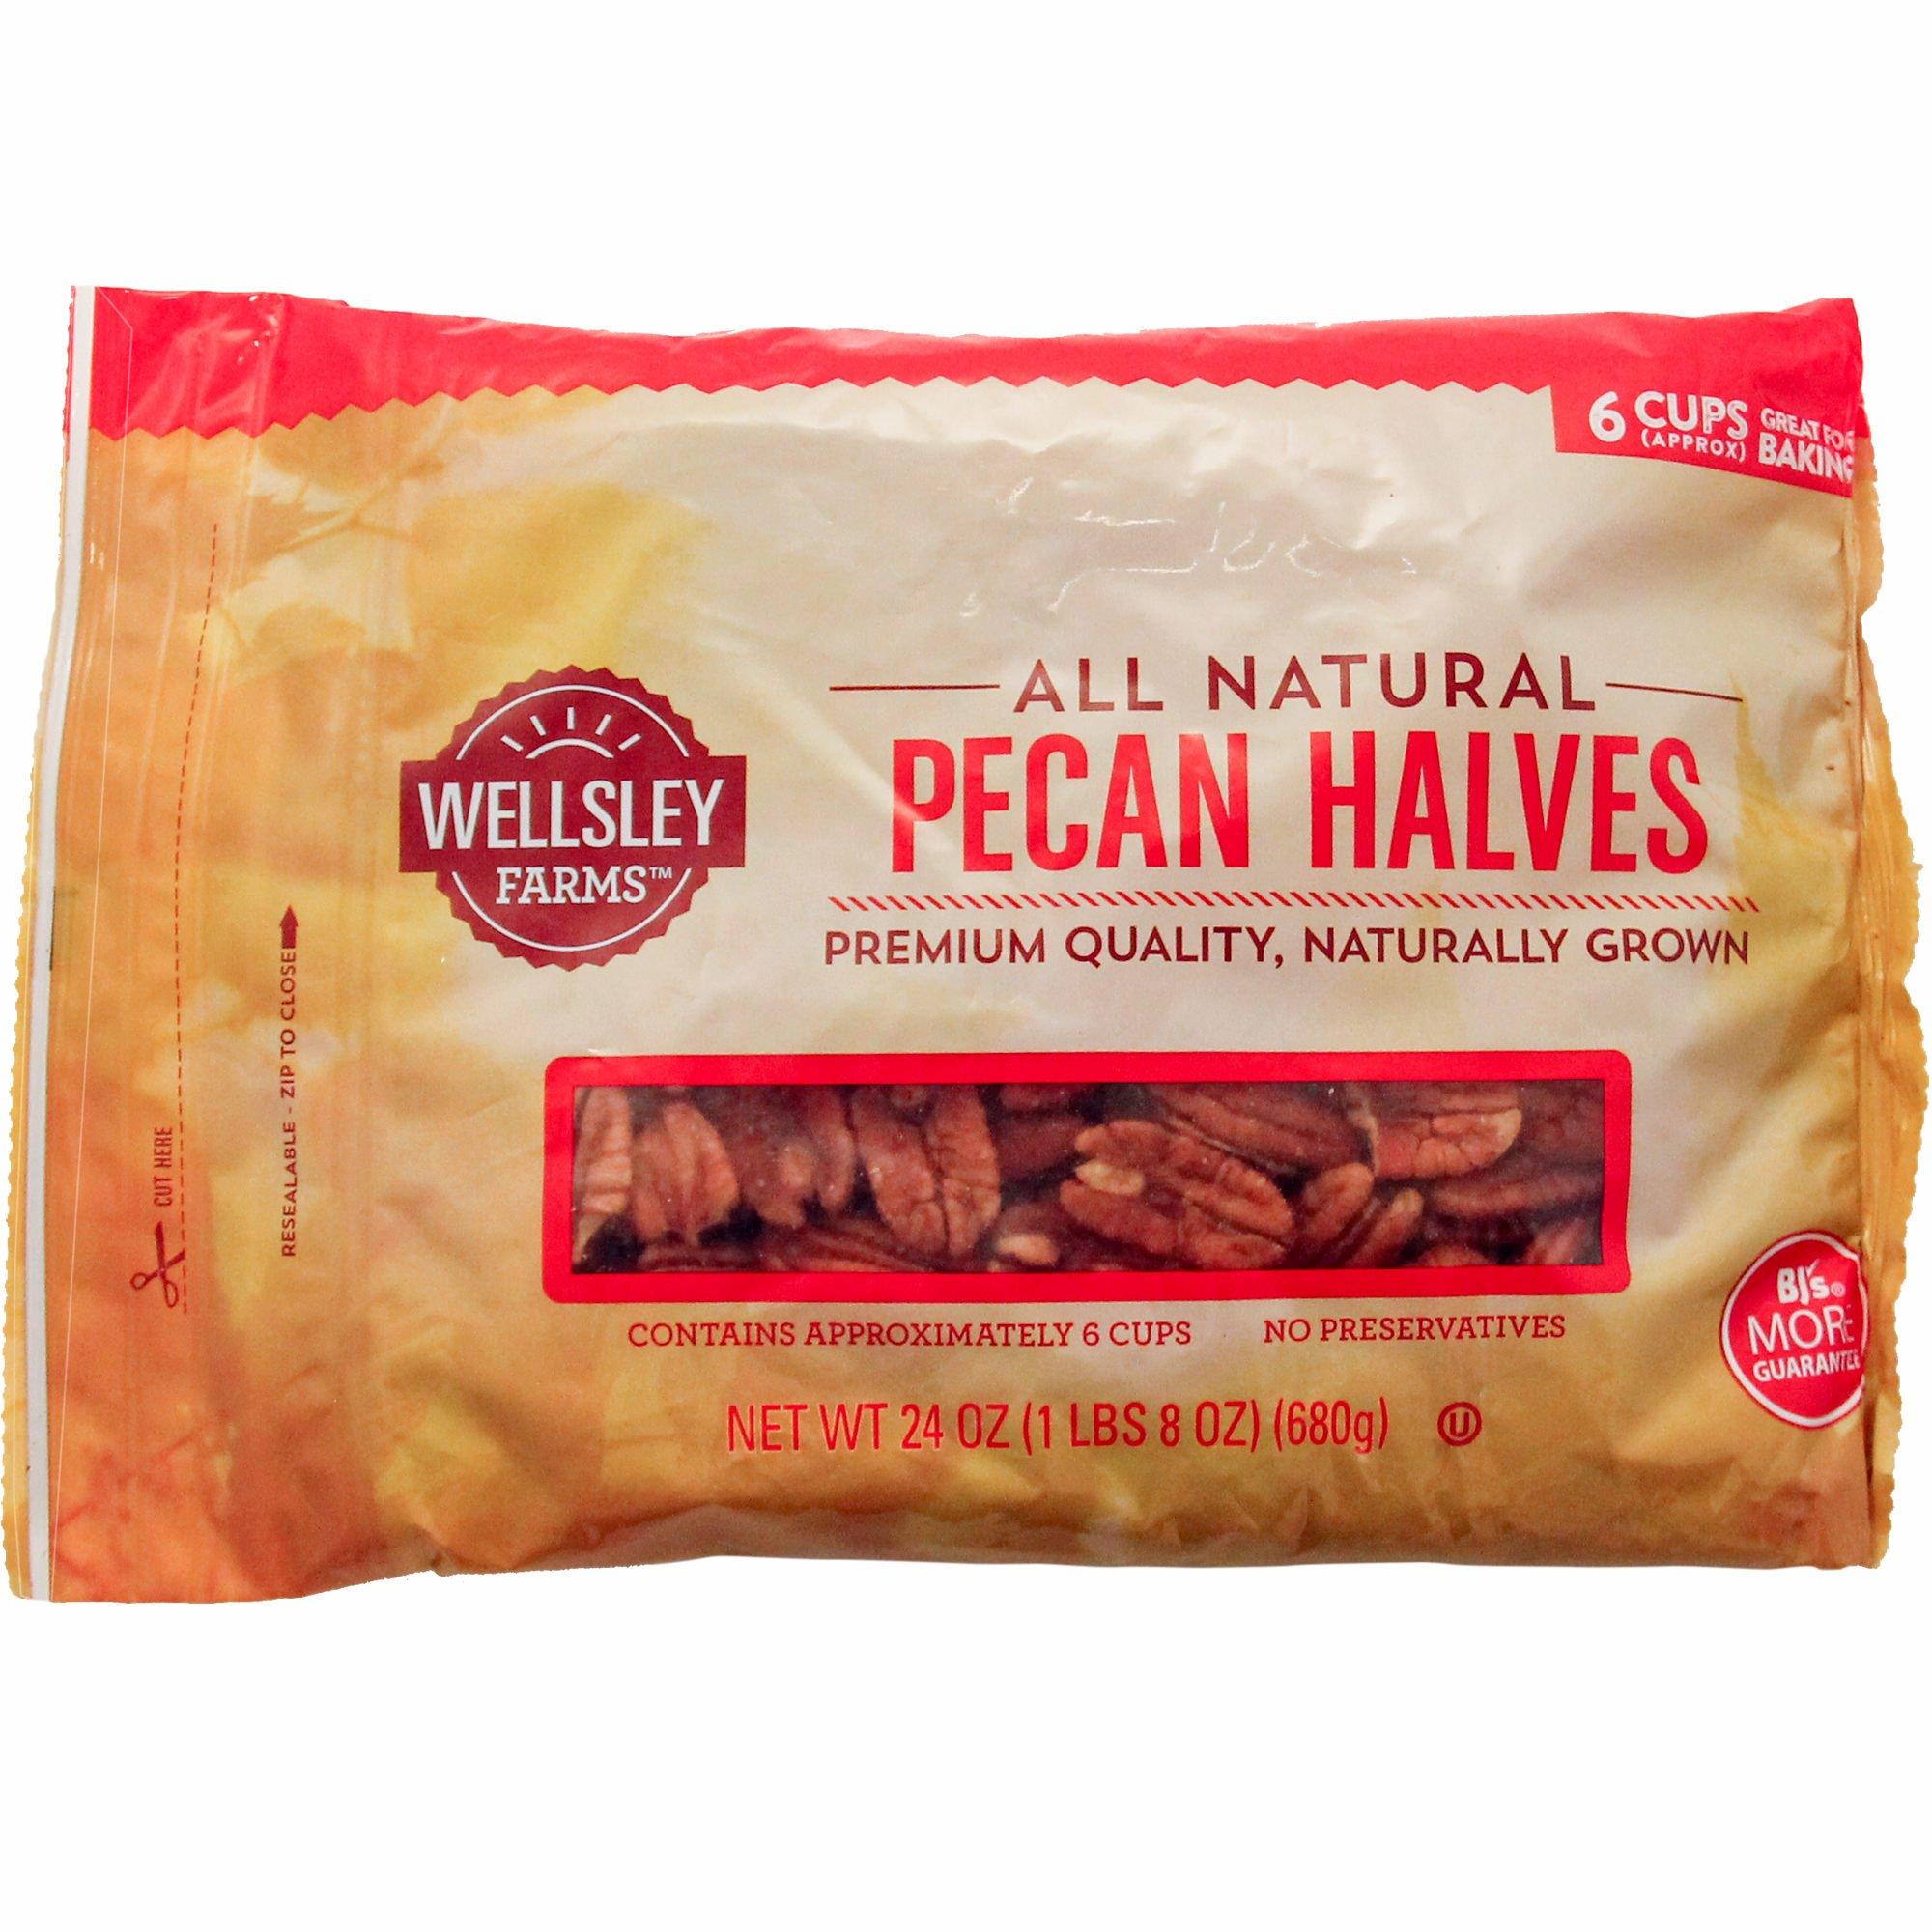 Wellsley Farms Pecan Halves, 24 oz.(pack of 2)